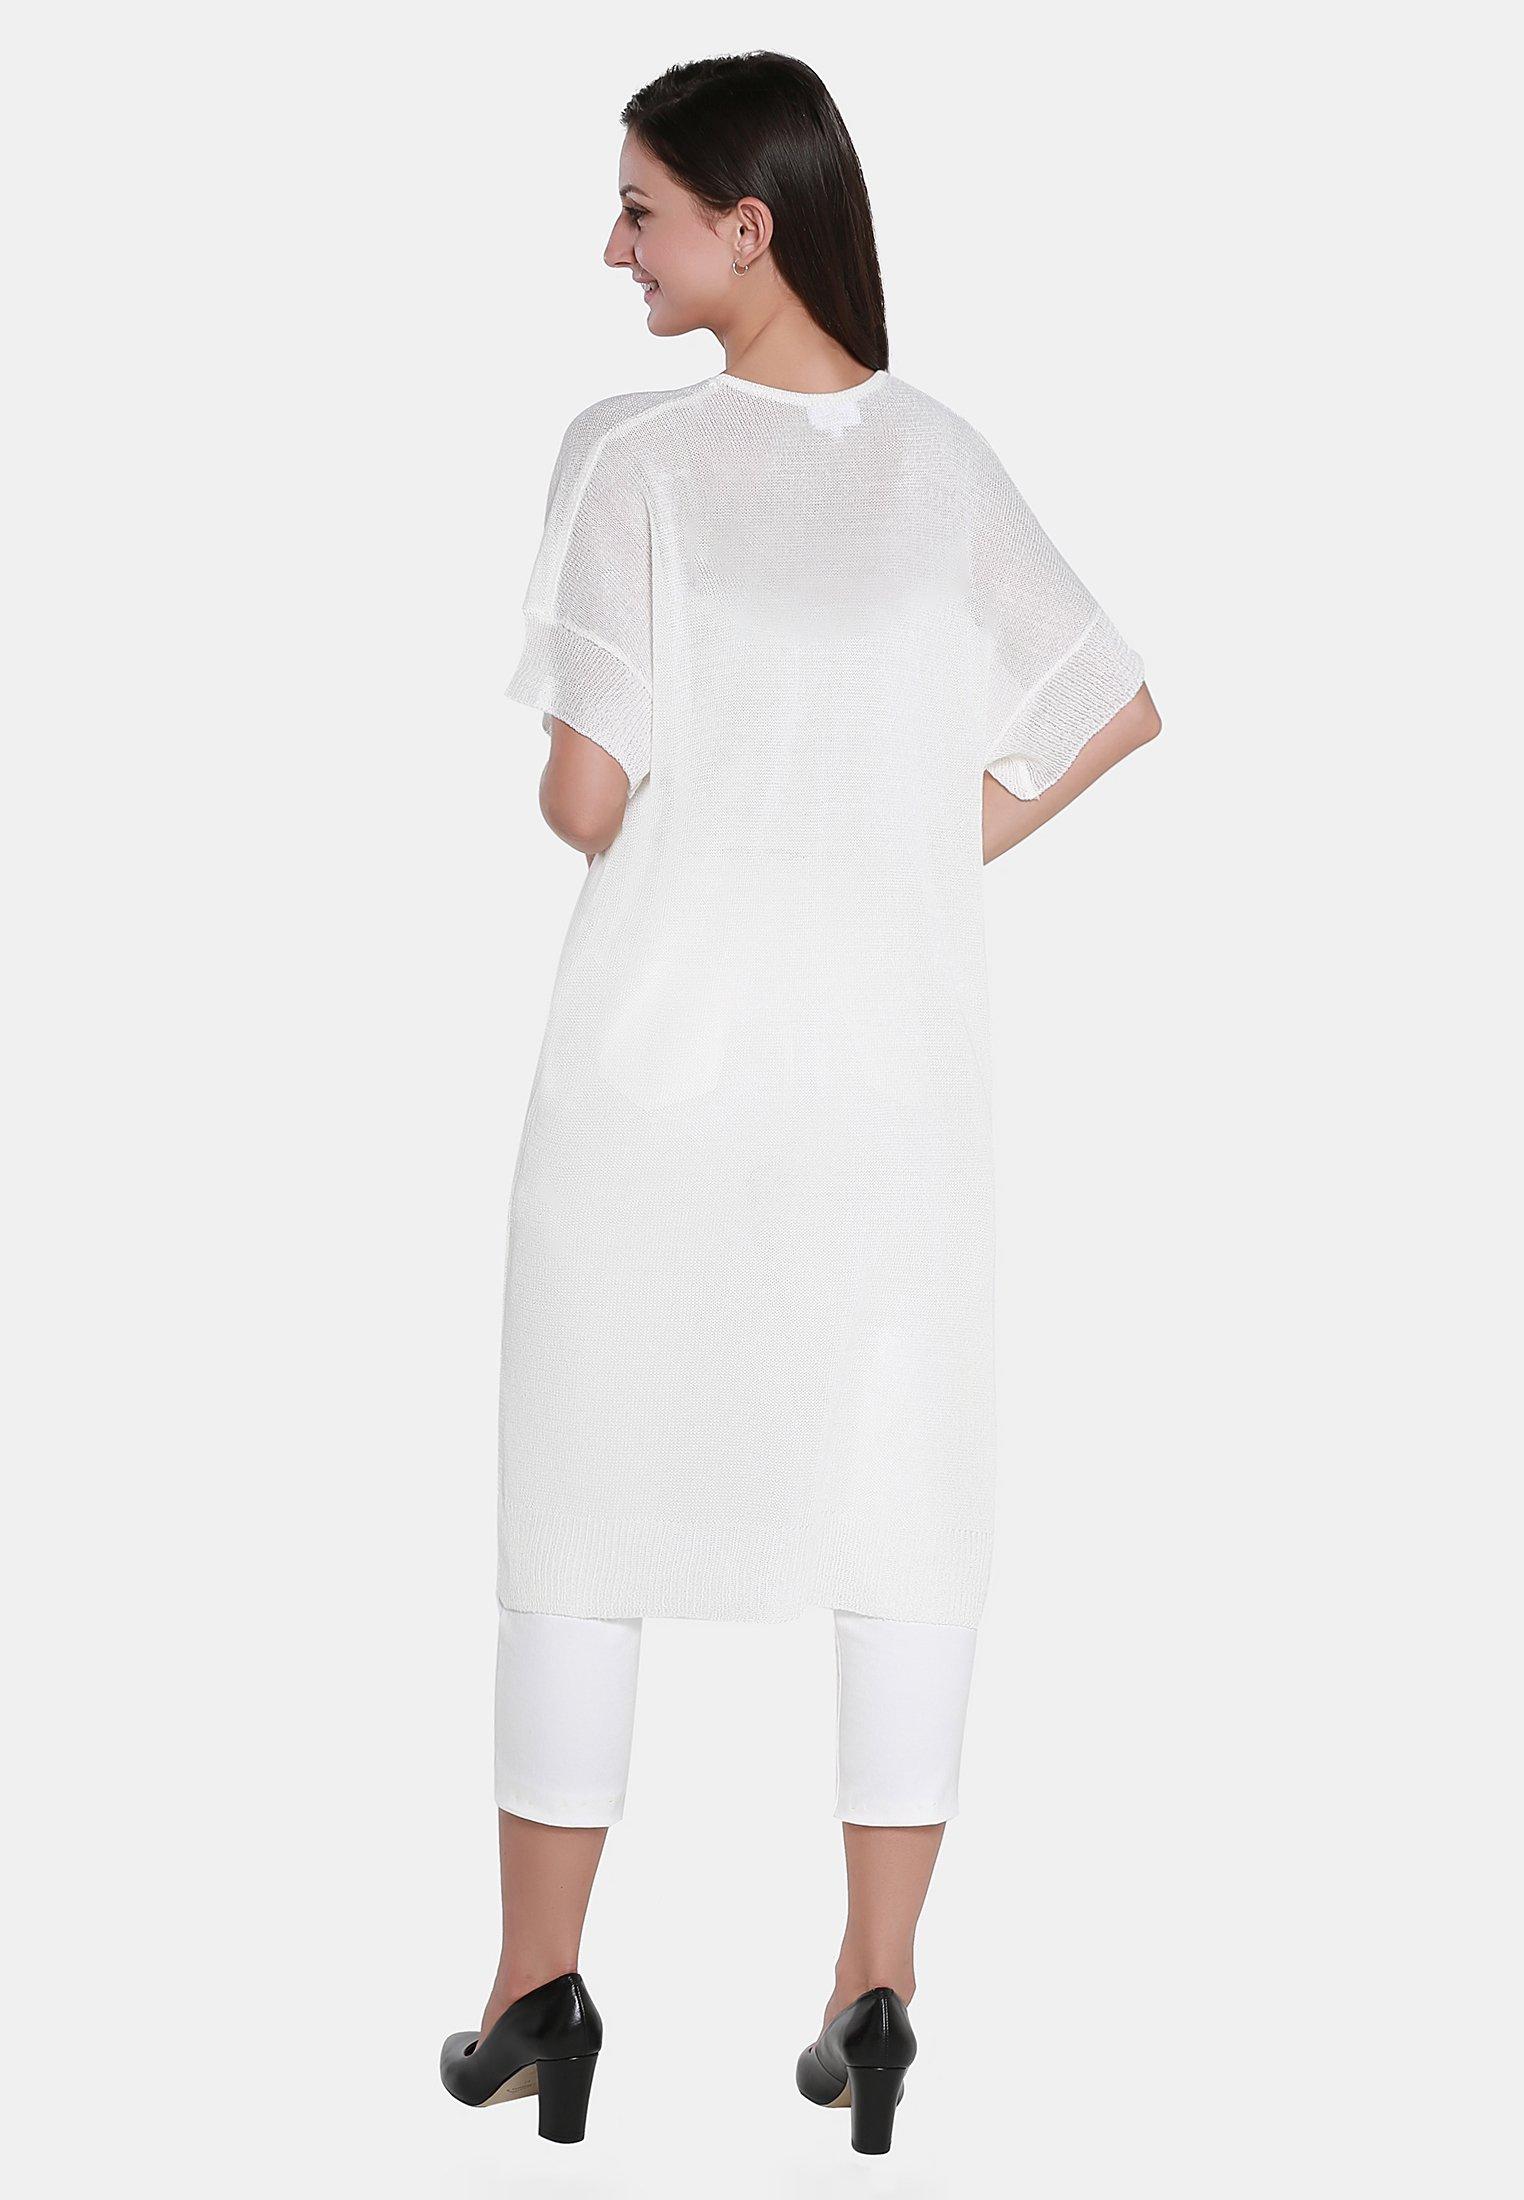 Perfect Women's Clothing usha Cardigan white JI8Z0y9sq